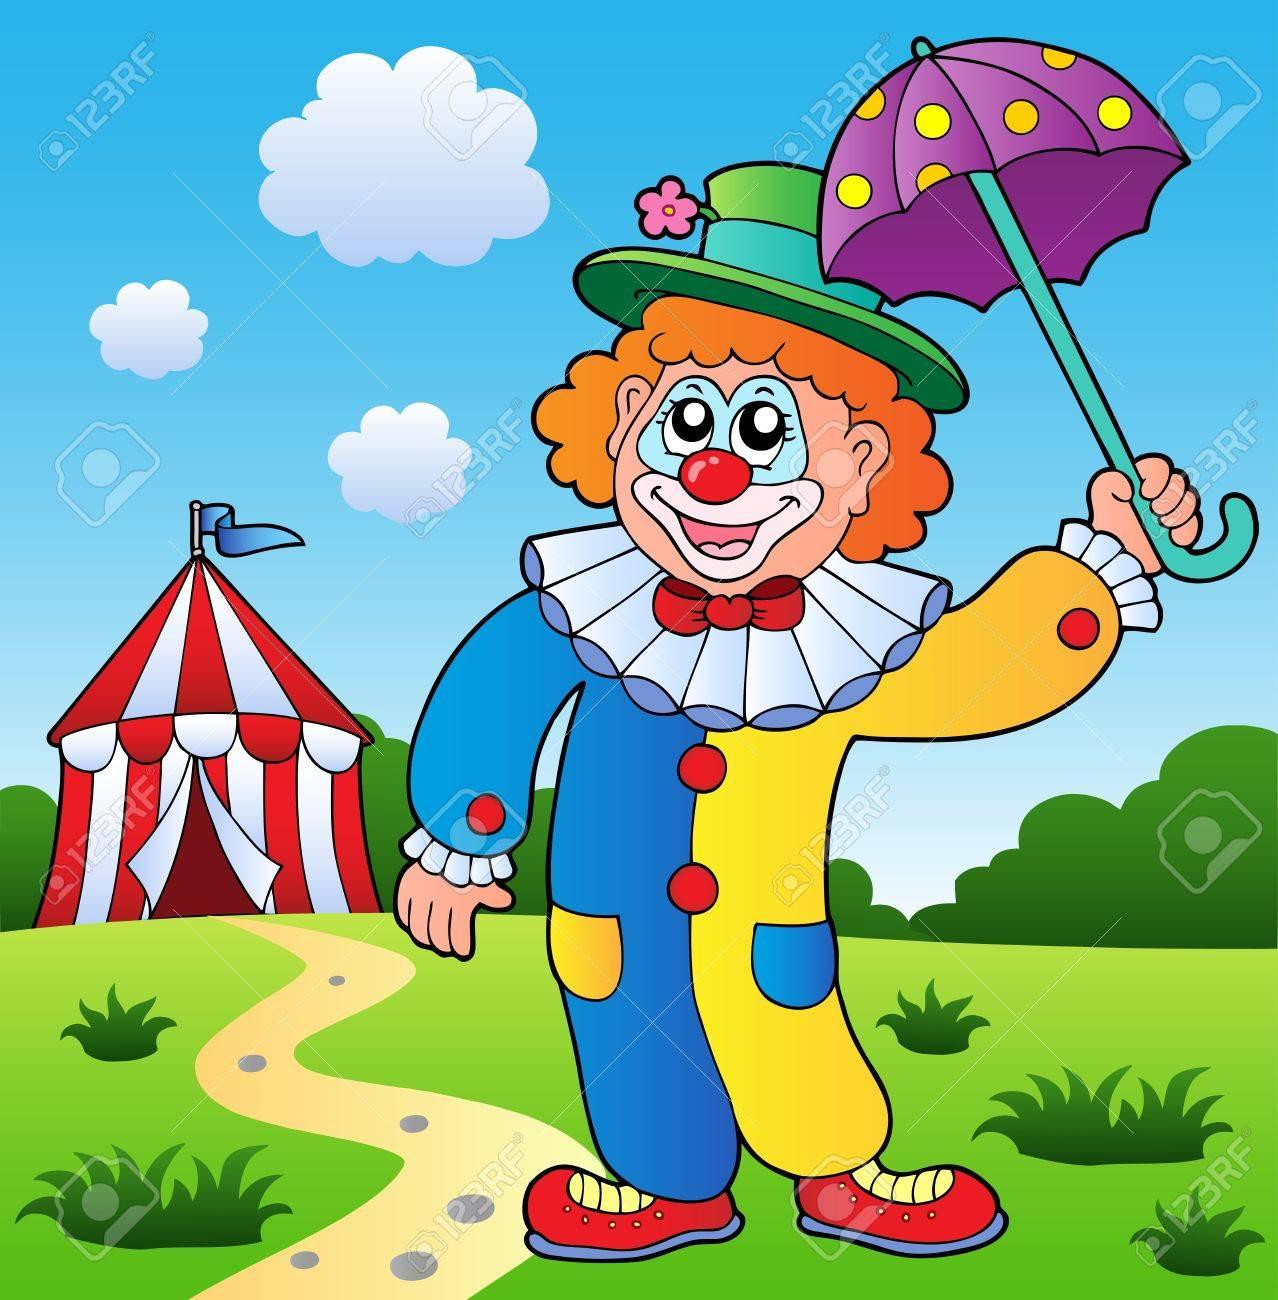 Clown theme picture 4 - vector illustration. Stock Vector - 11654774